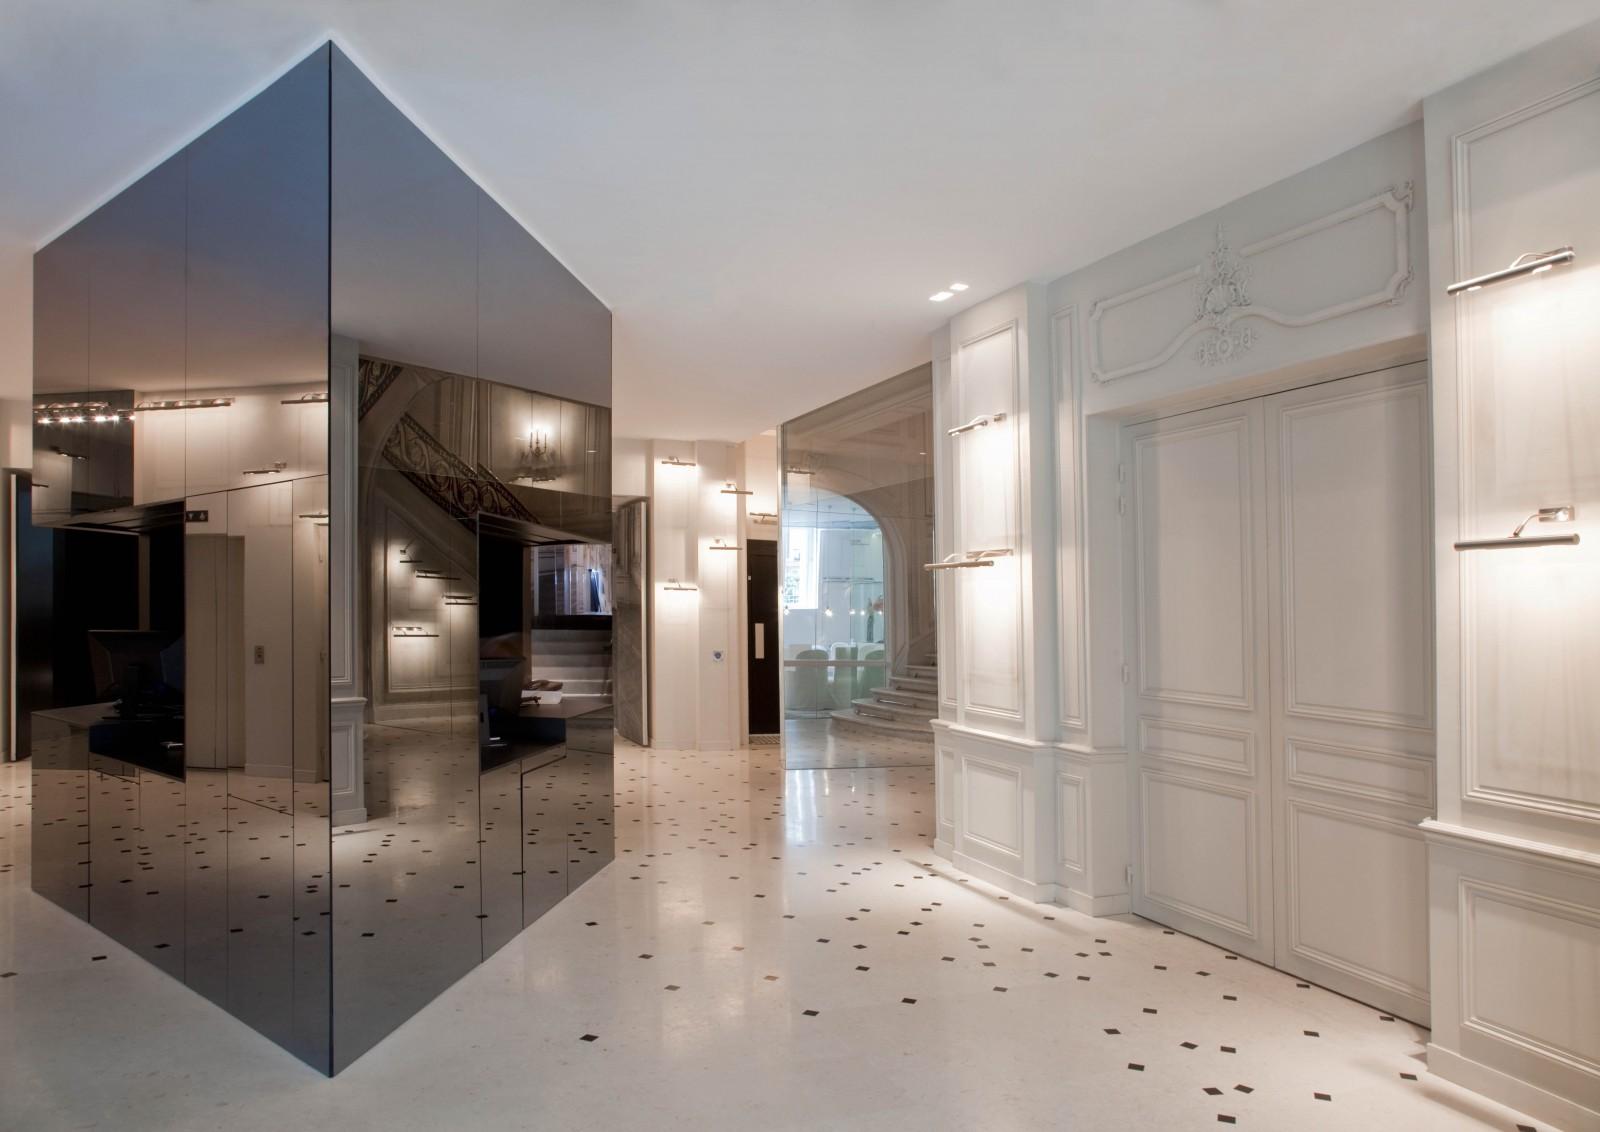 la-maison-champs-elysees-hotel-lobby